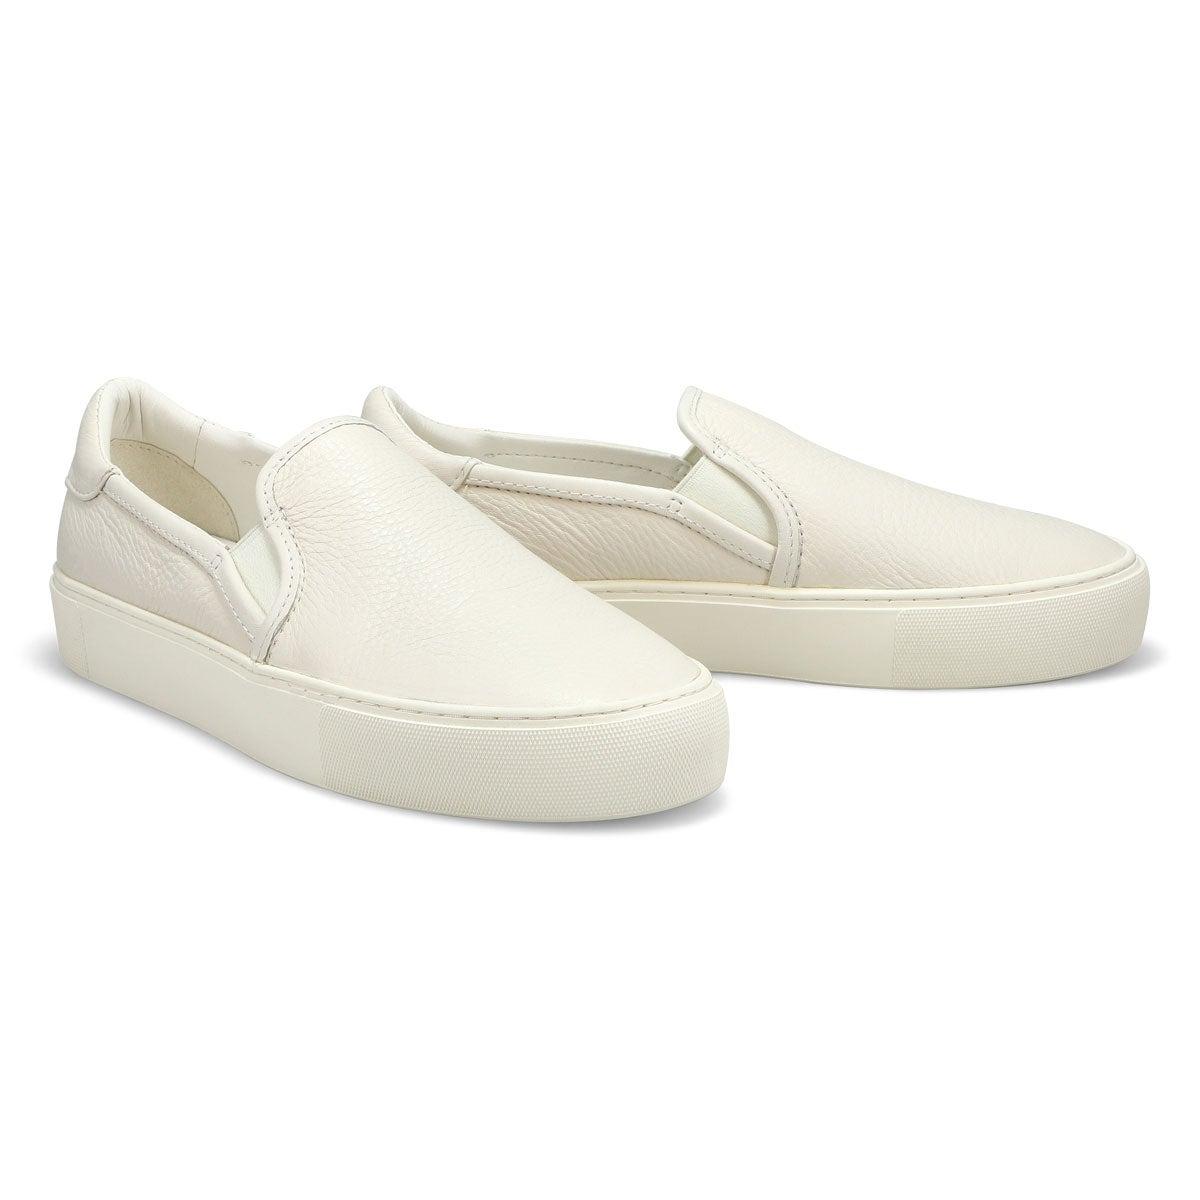 Lds Jass white slip on shoe